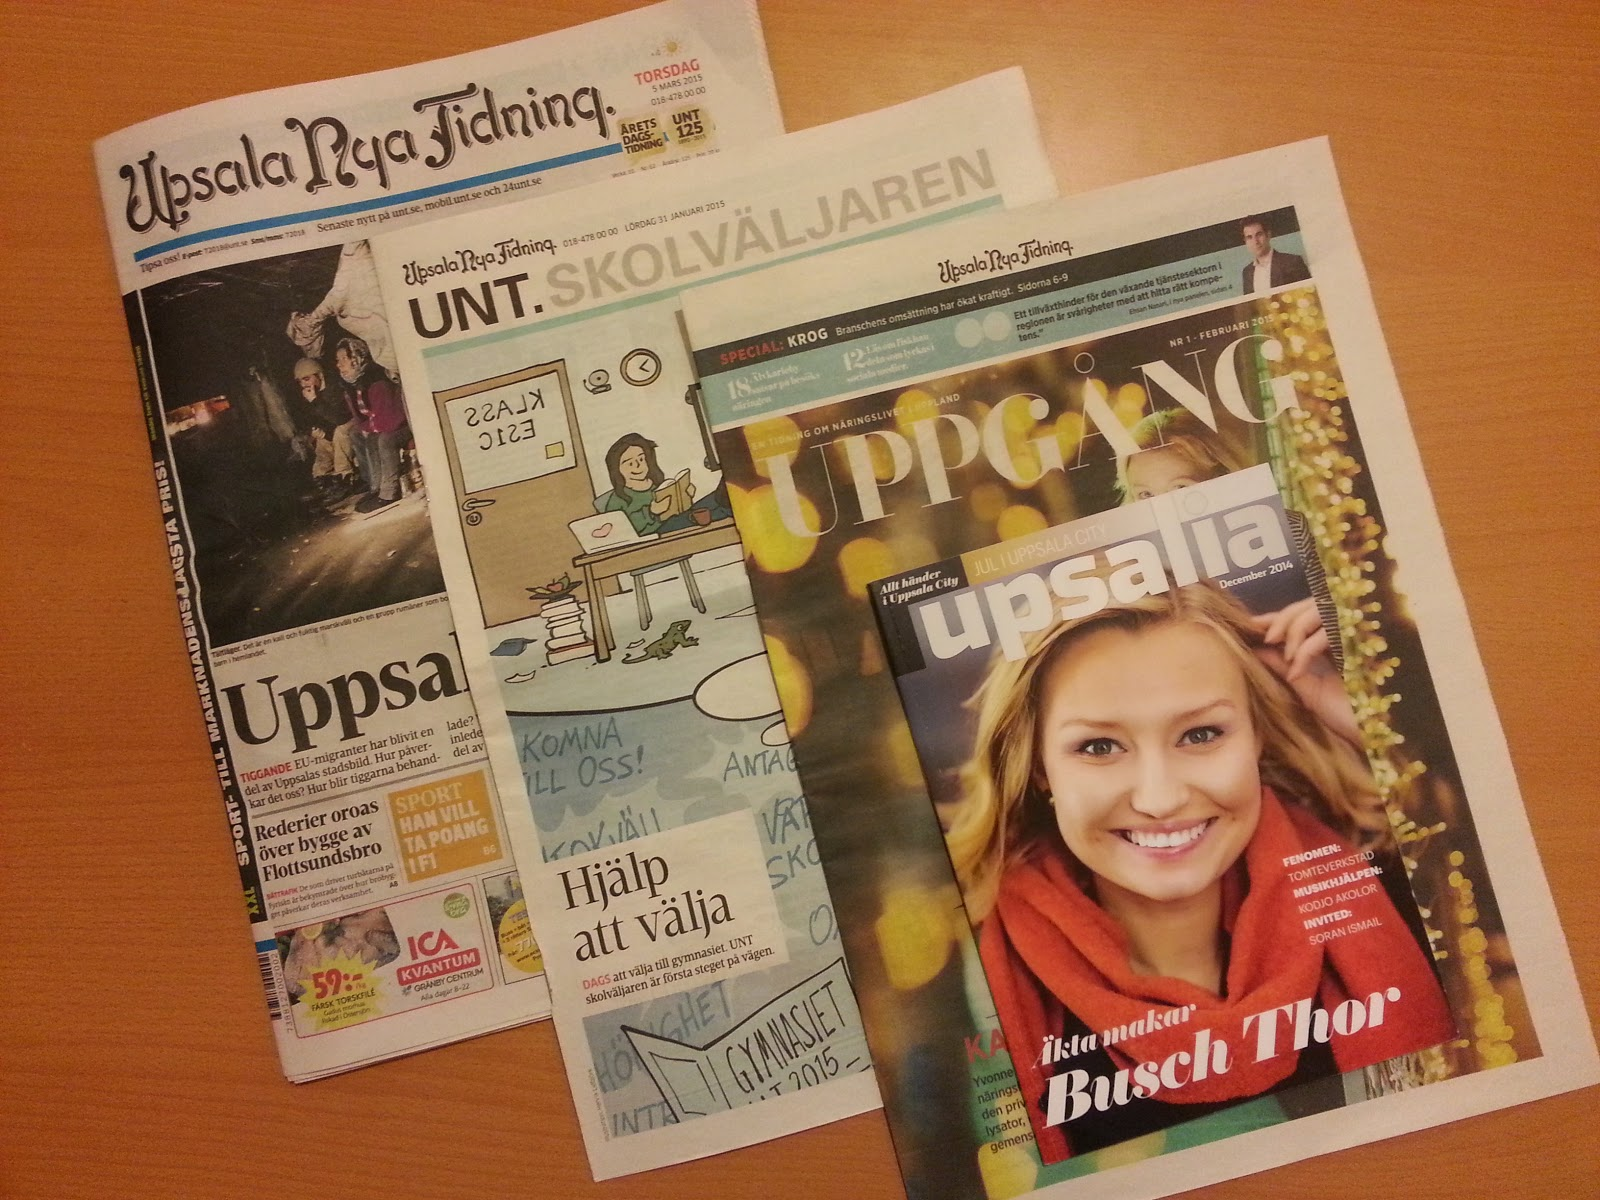 газеты Швеции Уппсала